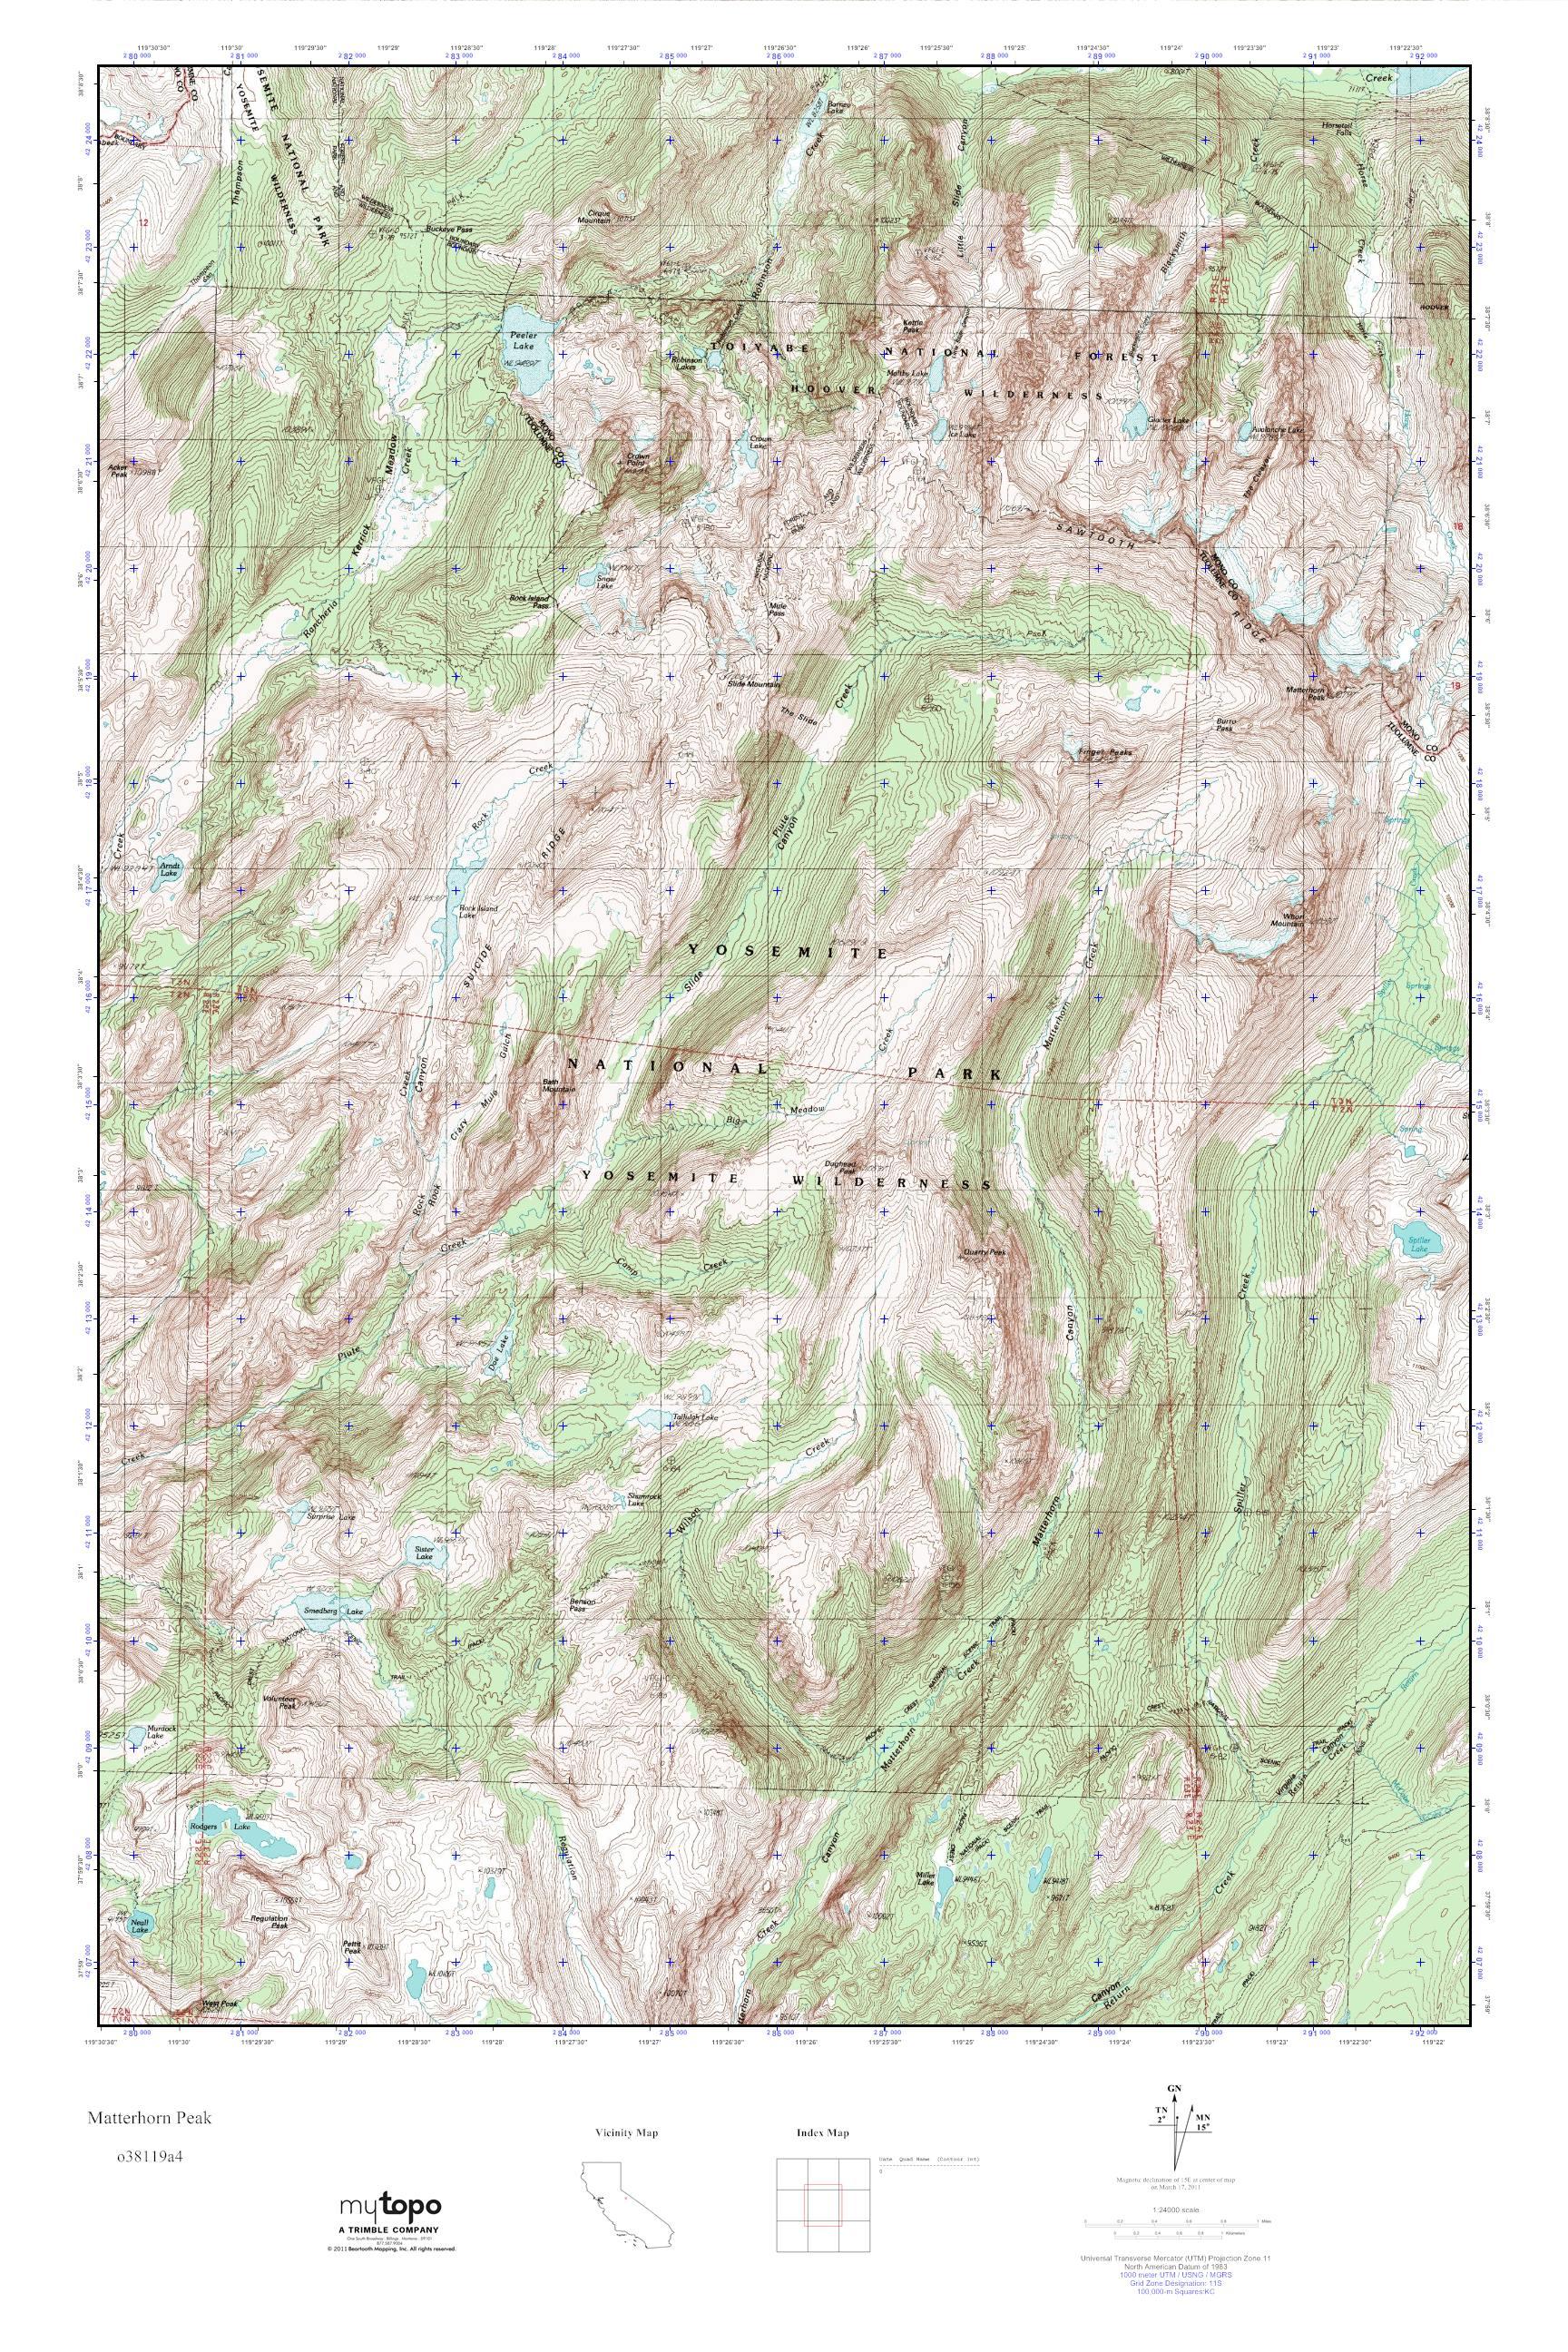 MyTopo Matterhorn Peak, California USGS Quad Topo Map